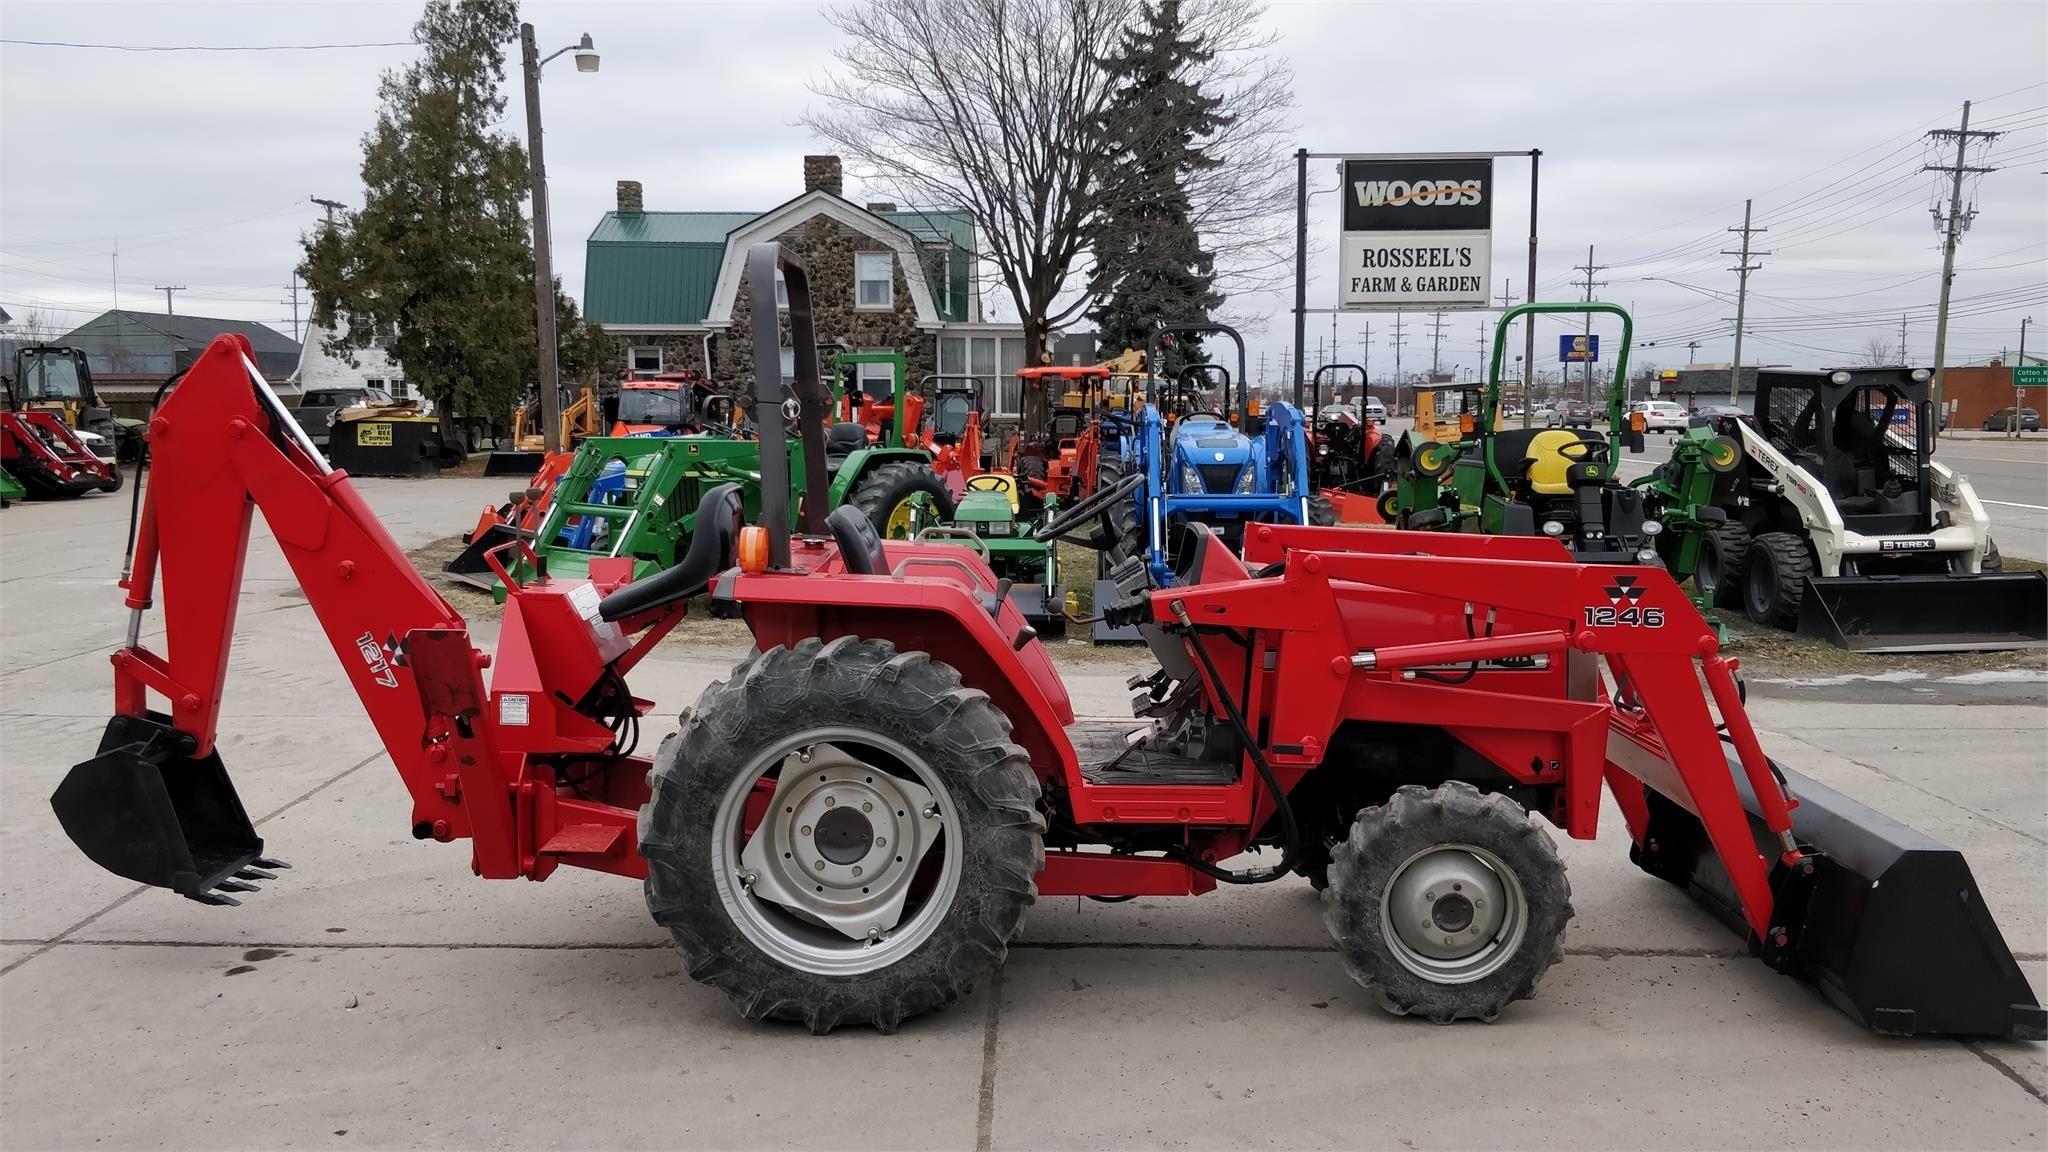 1998 Massey Ferguson 1240 Tractor - Chesterfield, Michigan | Machinery Pete